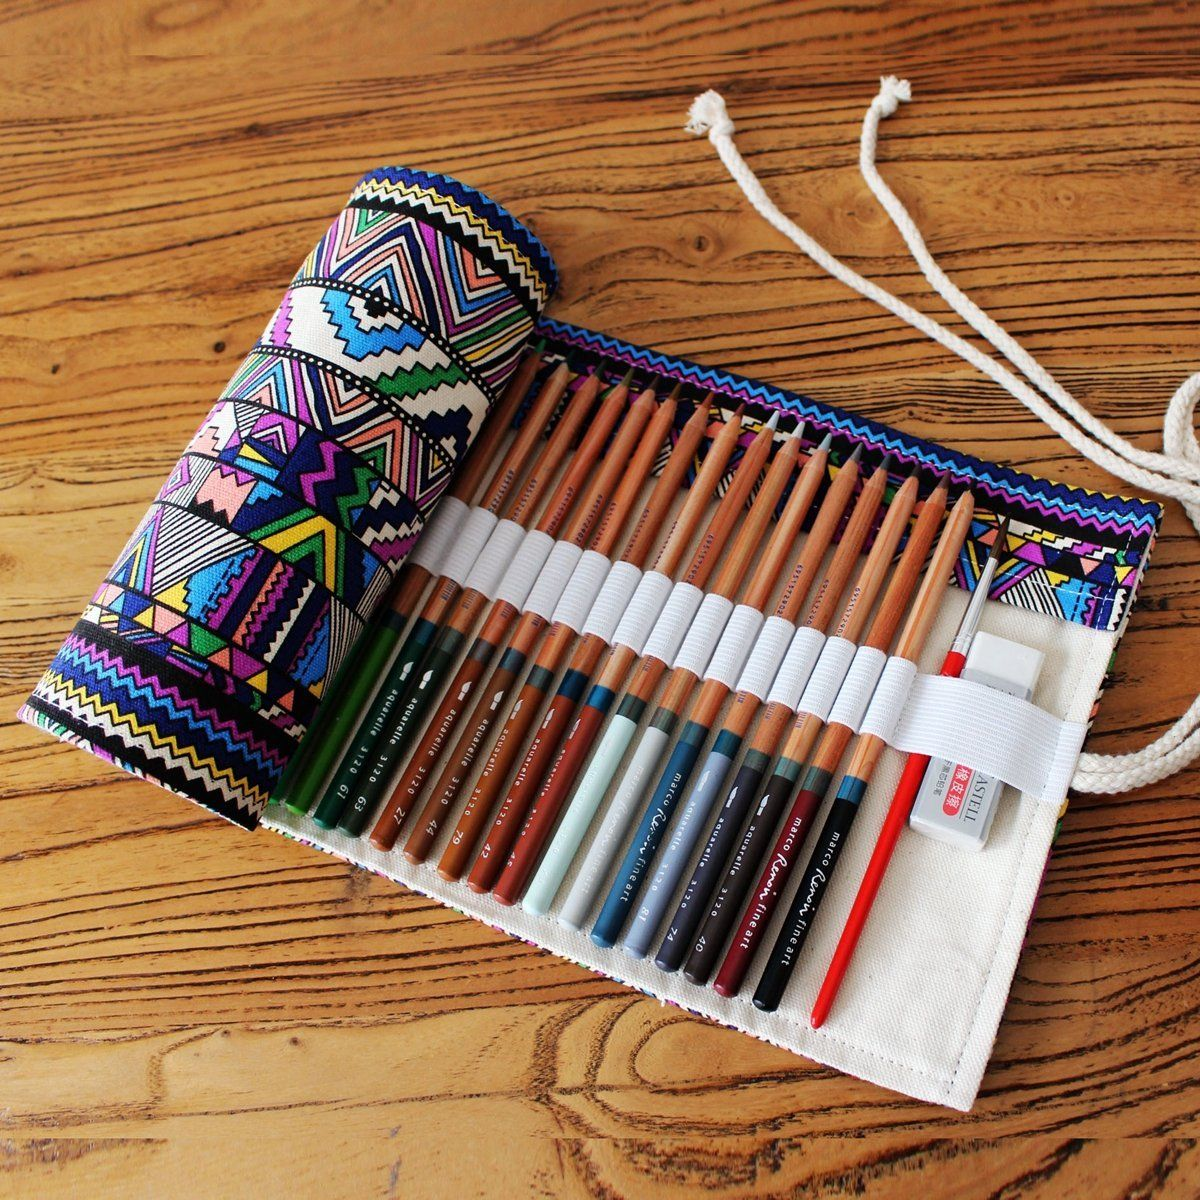 GUchina Canvas Pencil Case, Canvas Pencil Wrap